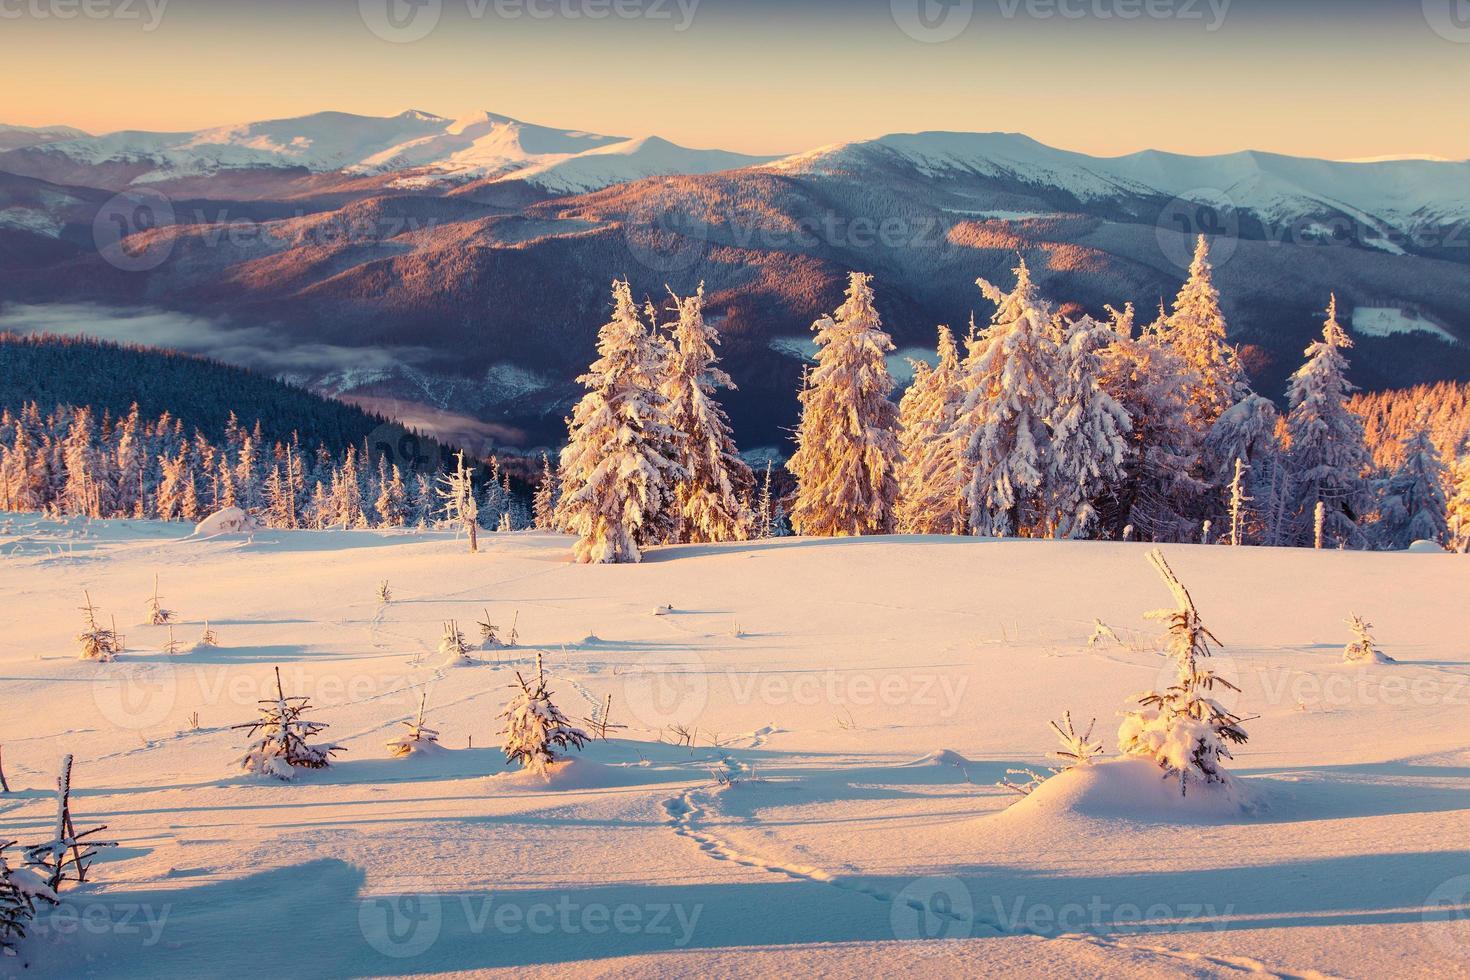 zonnige ochtend zonsopgang in de bergen van de winter foto